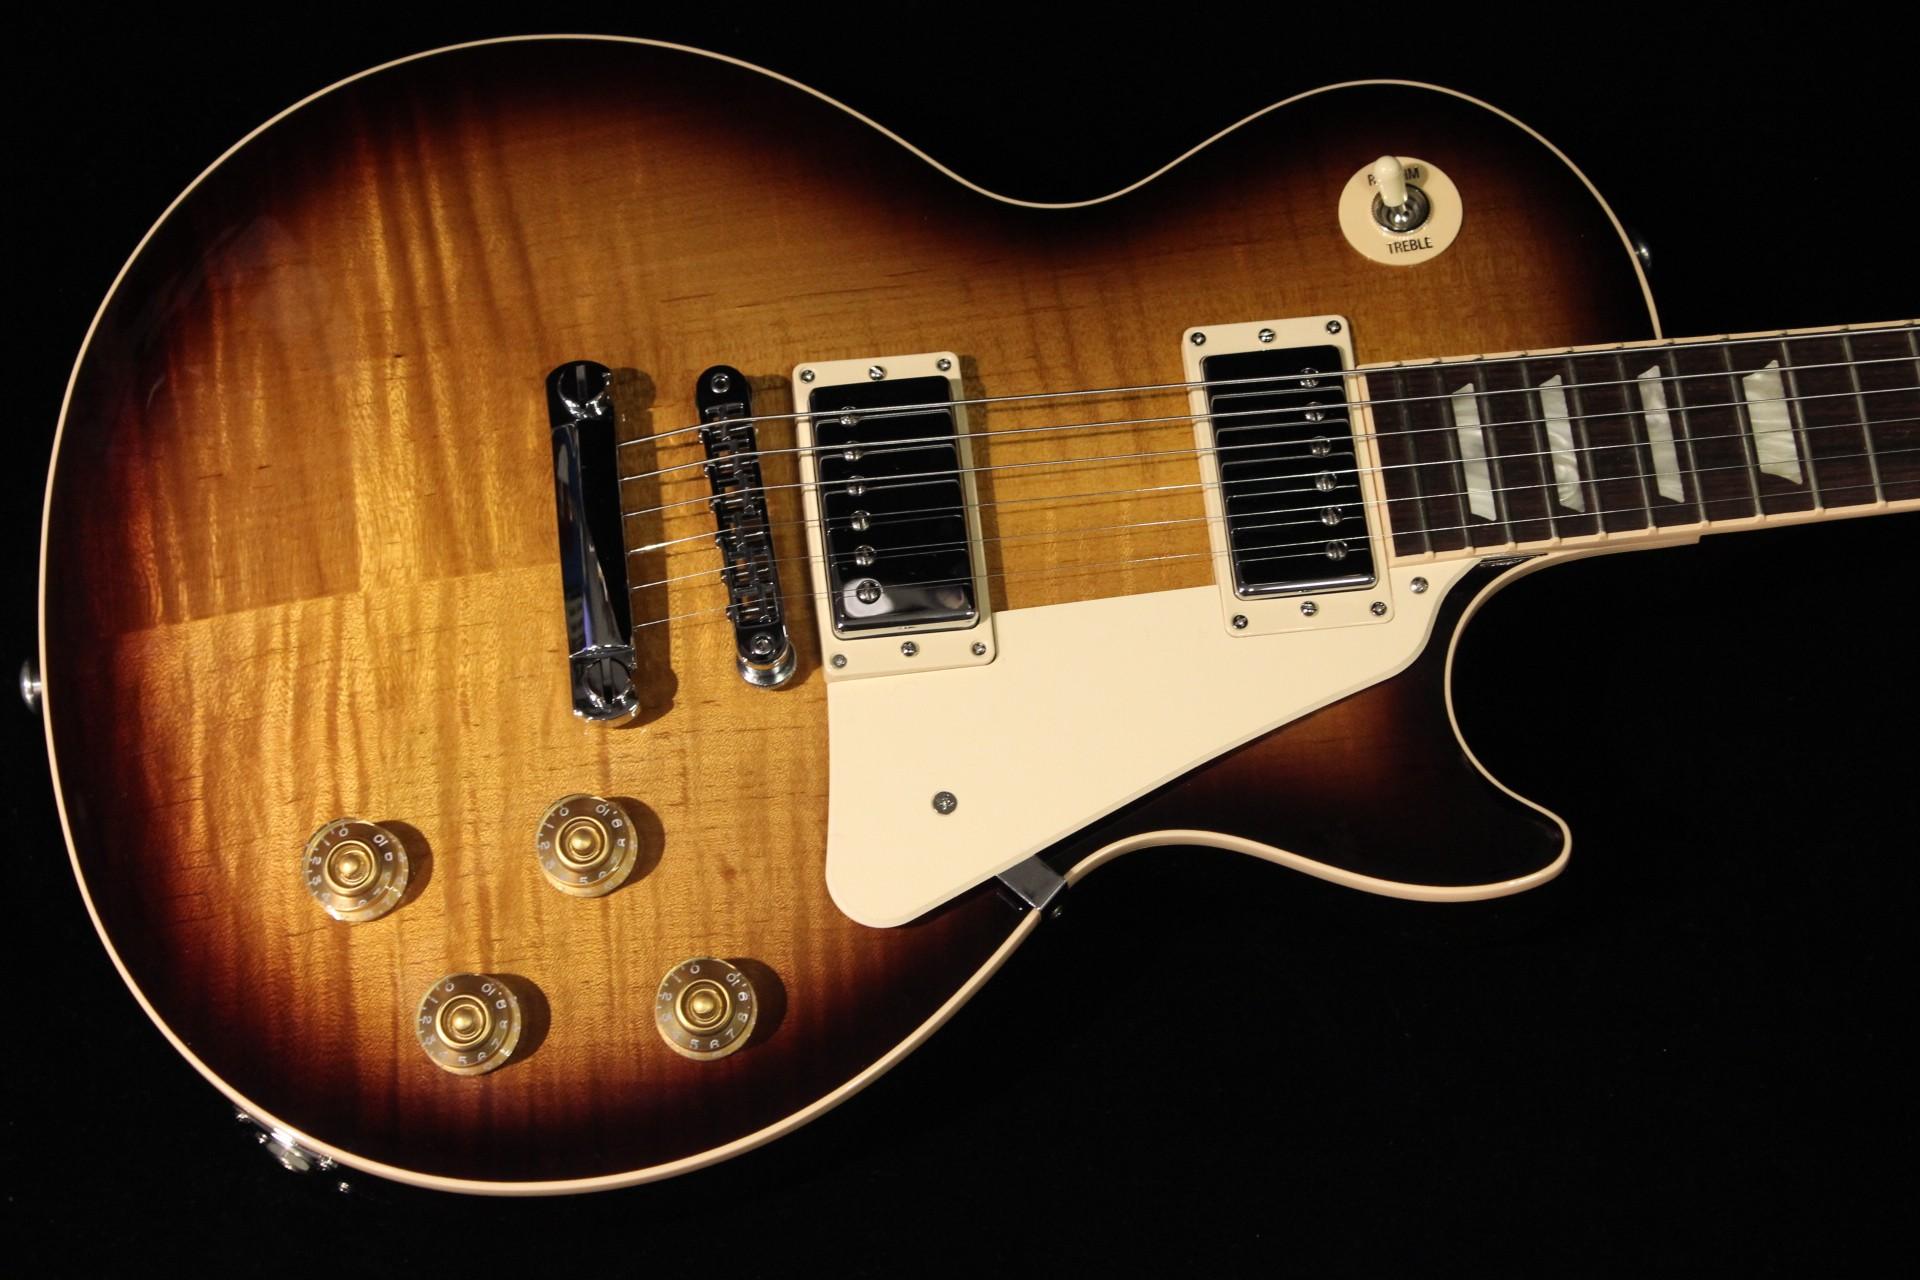 gibson les paul traditional t 2016 desert burst sn 160006237 gino guitars. Black Bedroom Furniture Sets. Home Design Ideas